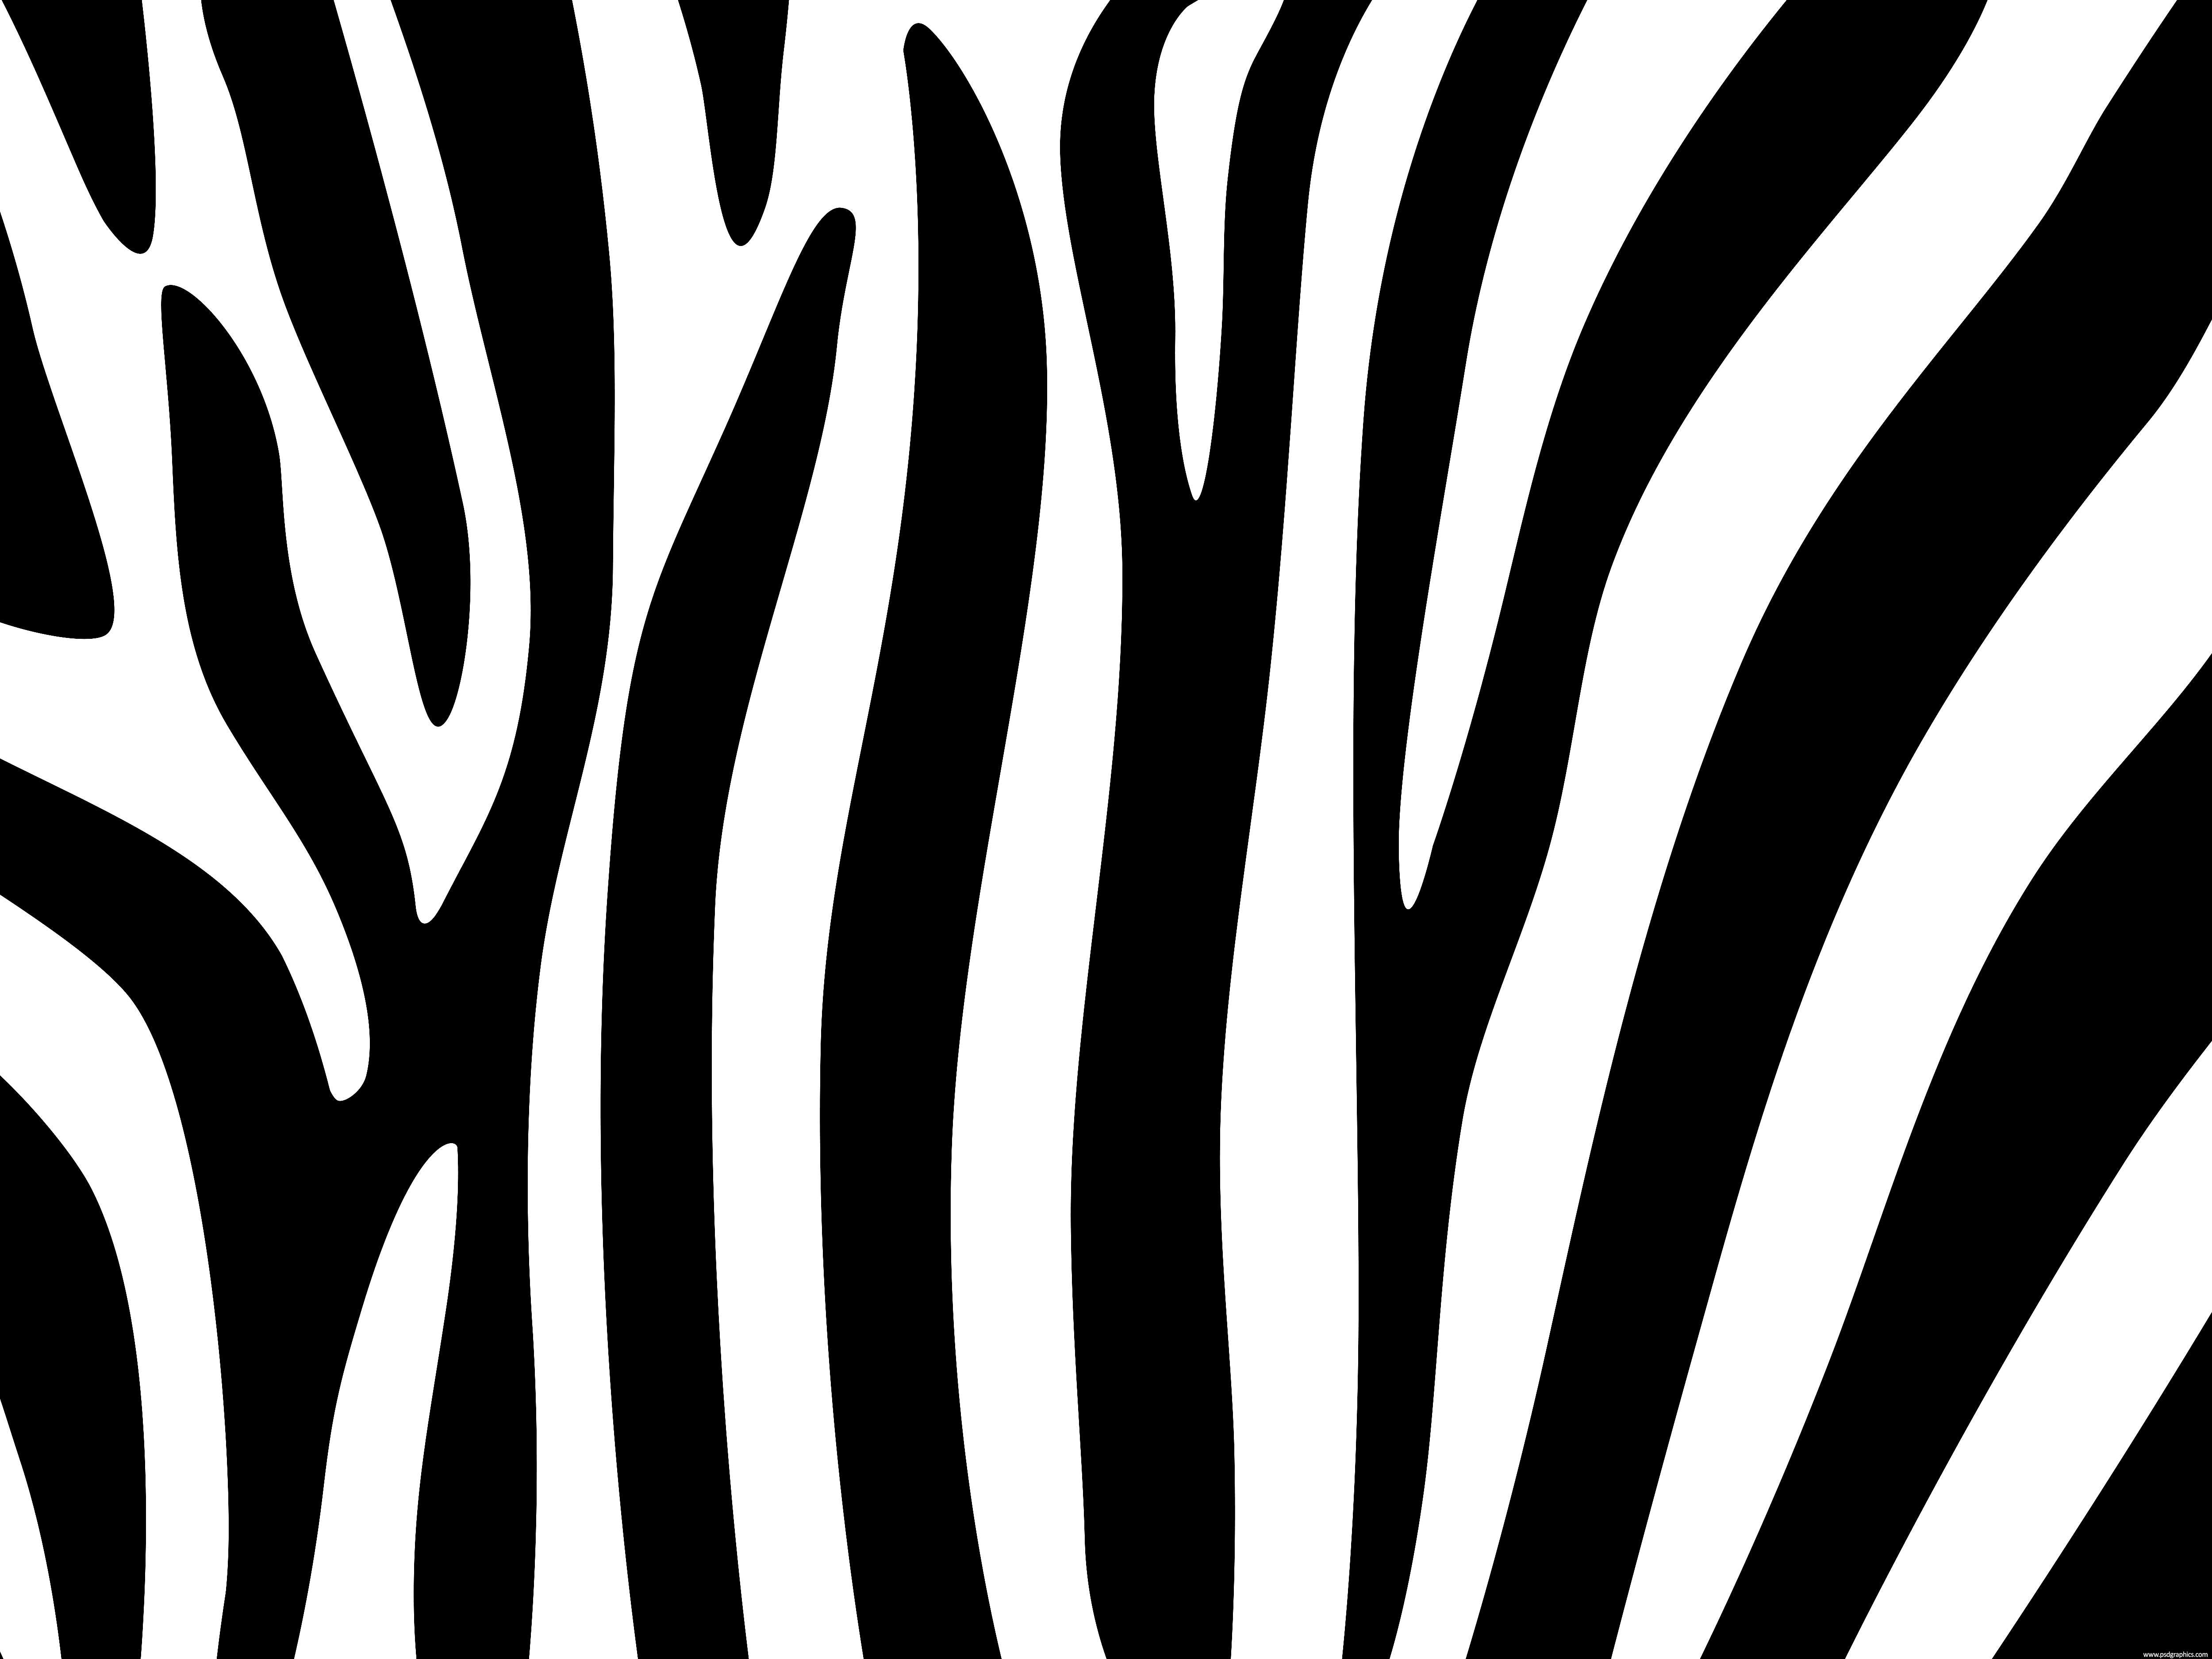 Pin by Jheuel Carter-Guy on RA decor in 2019 | Zebra striped